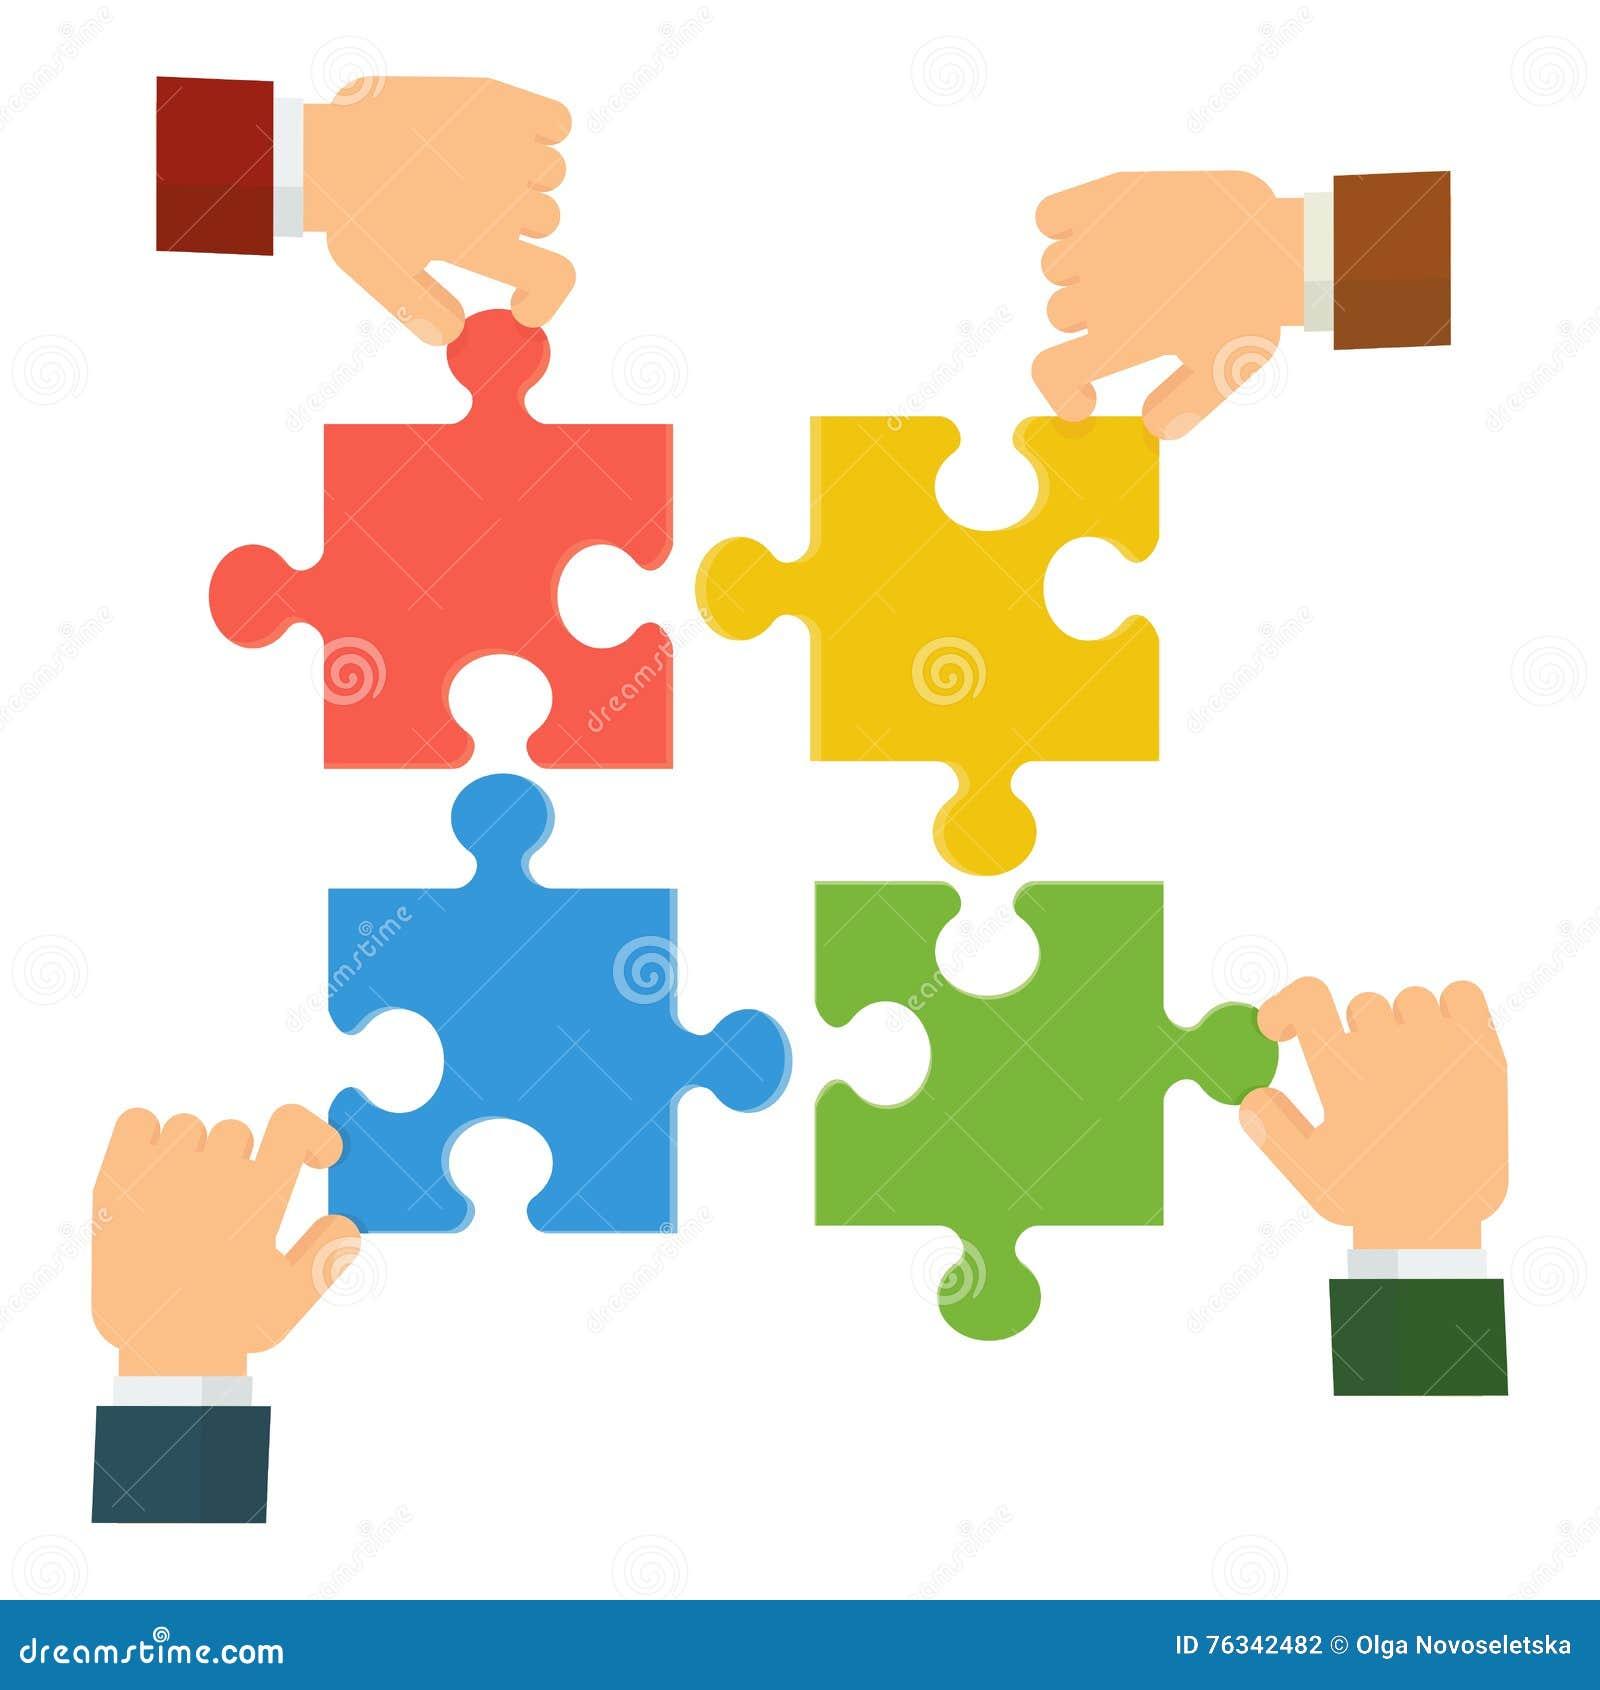 Руки собирают головоломку